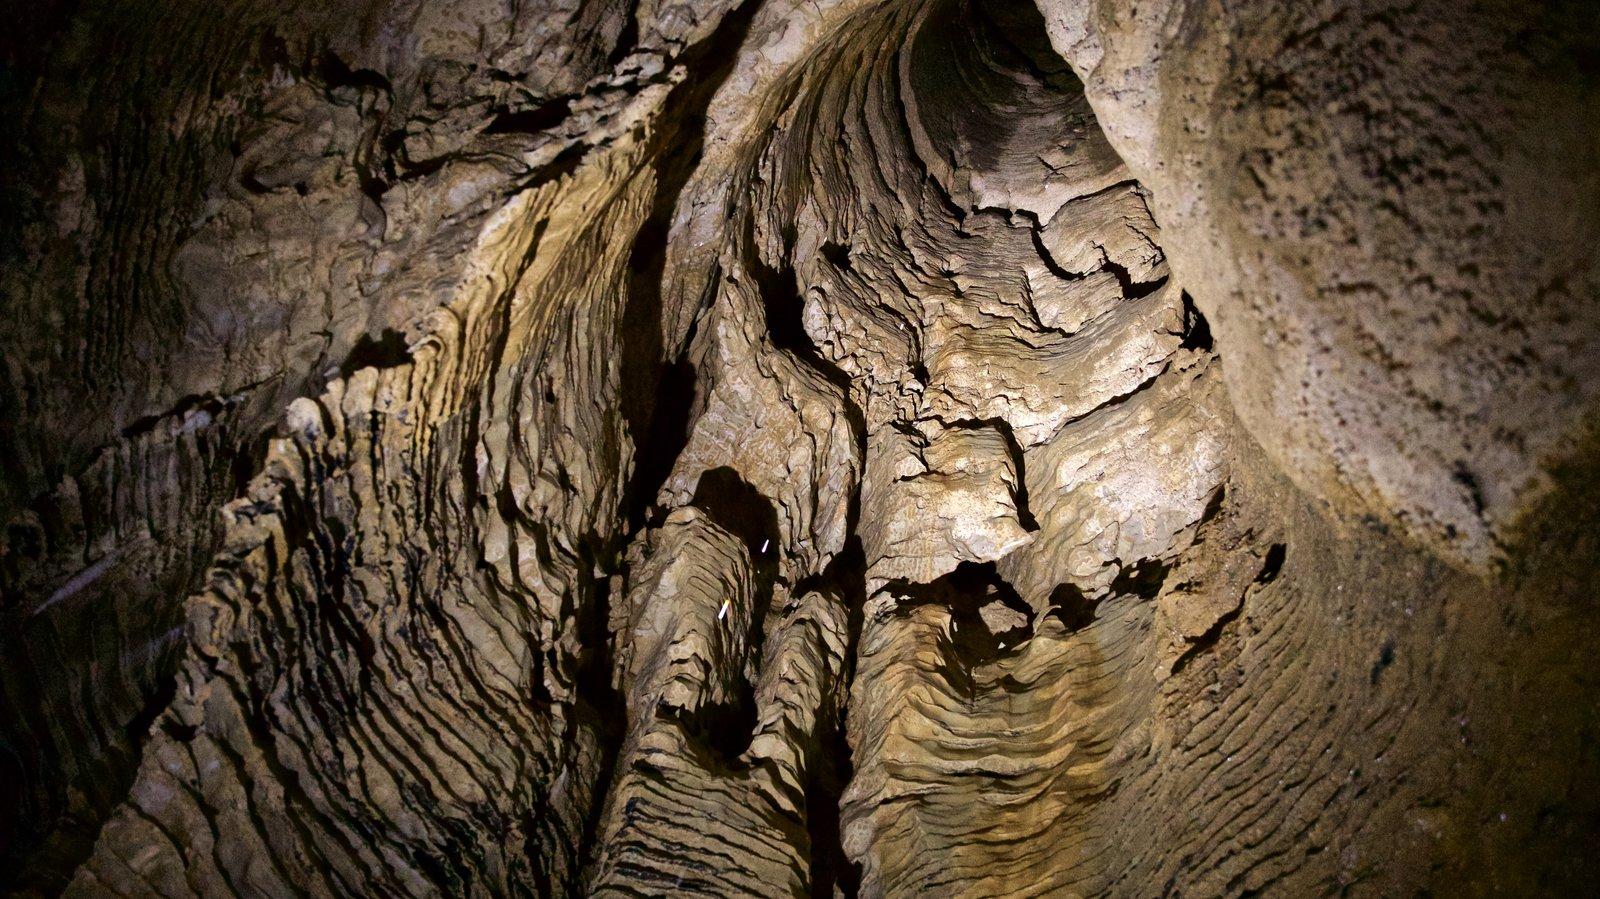 Waitomo Caves featuring caves